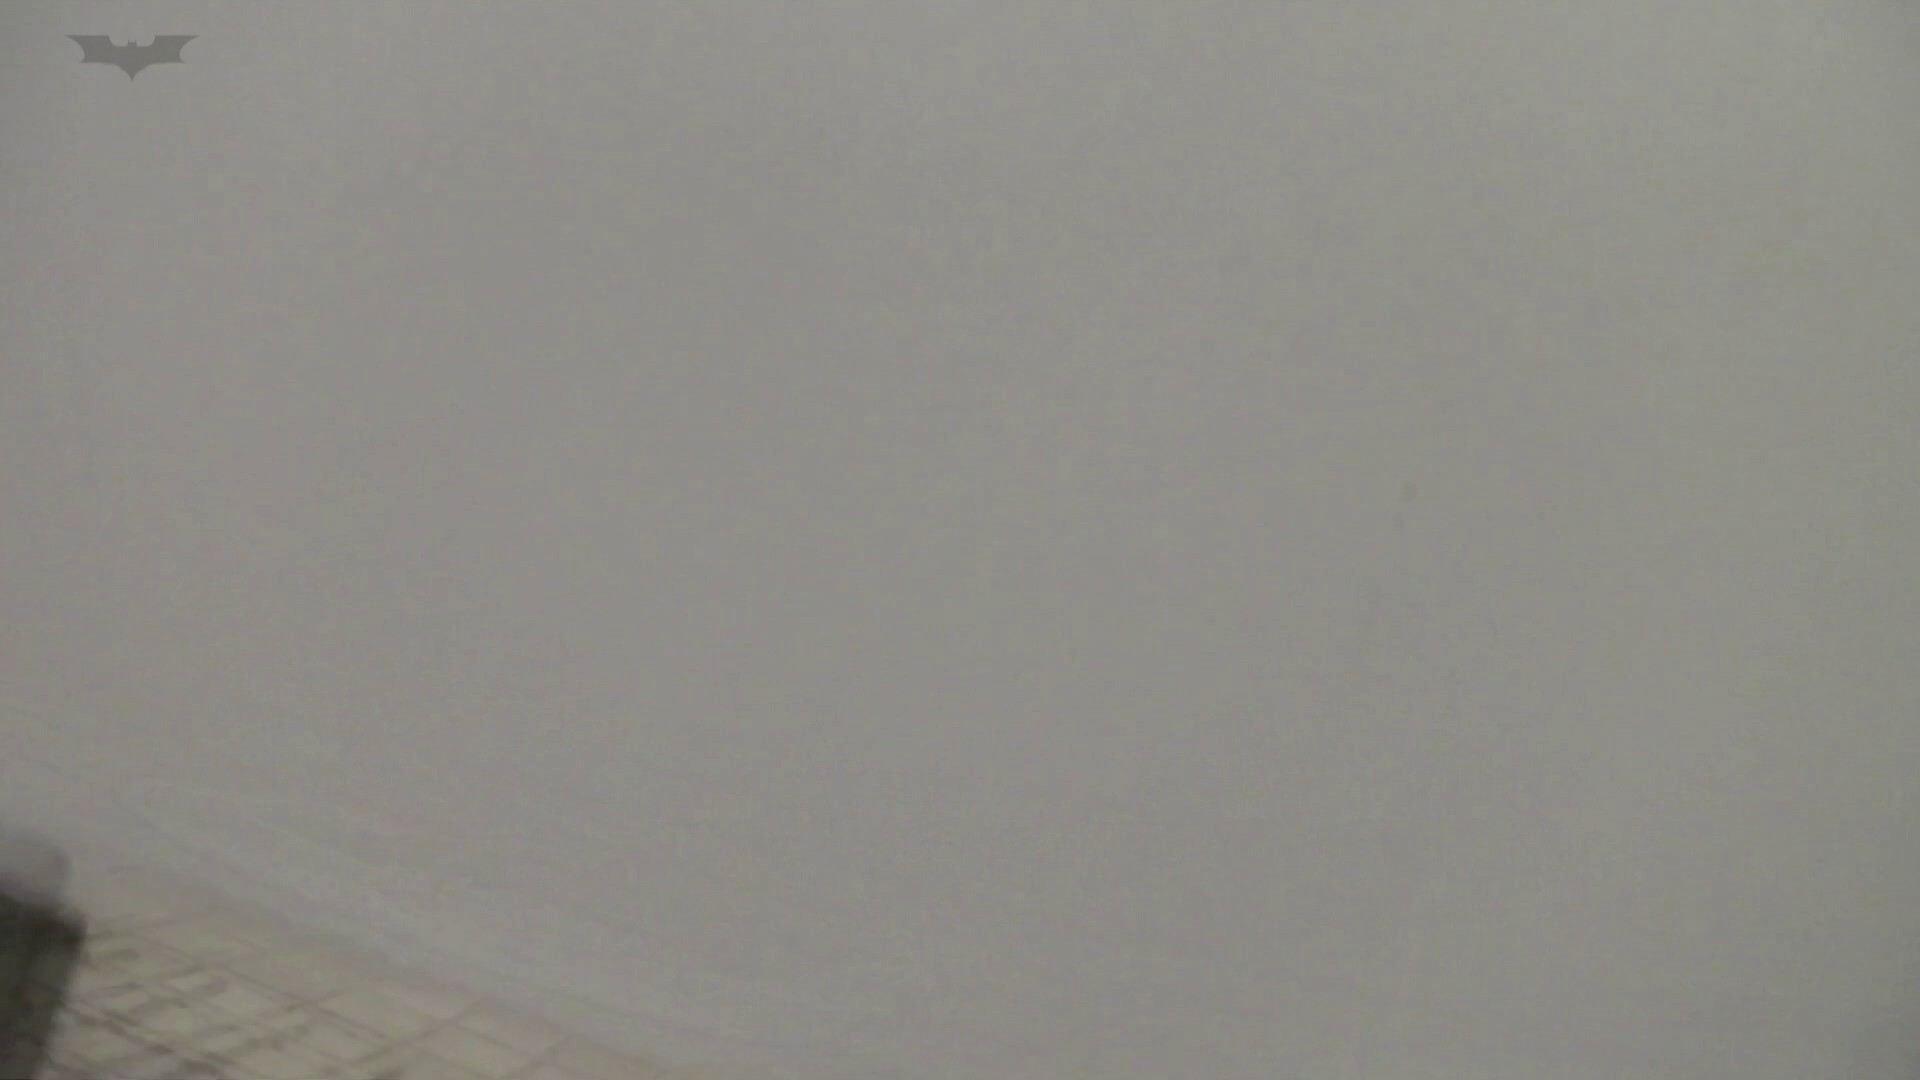 ▲復活限定D▲第三体育館潜入撮File018 夏帆に激似現役の未開発の下を 体育館 濡れ場動画紹介 19連発 17